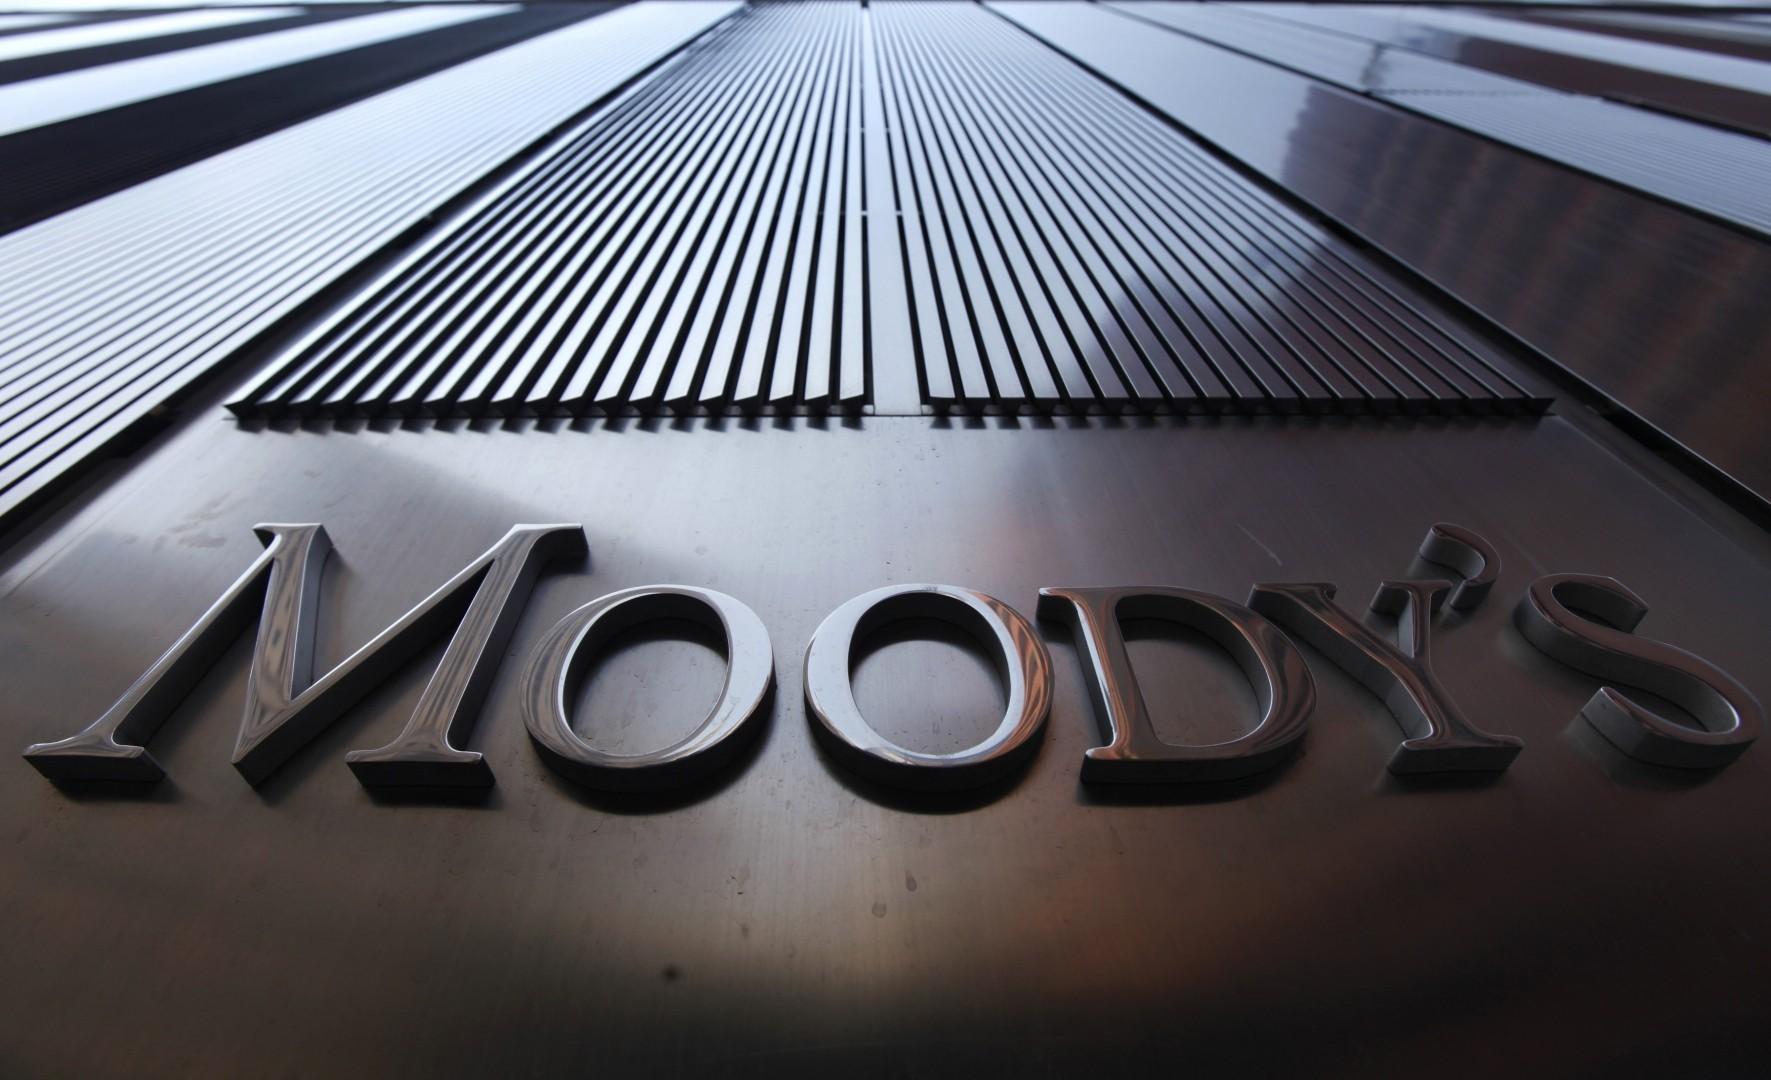 moodys cut chin bonds - HD1360×829